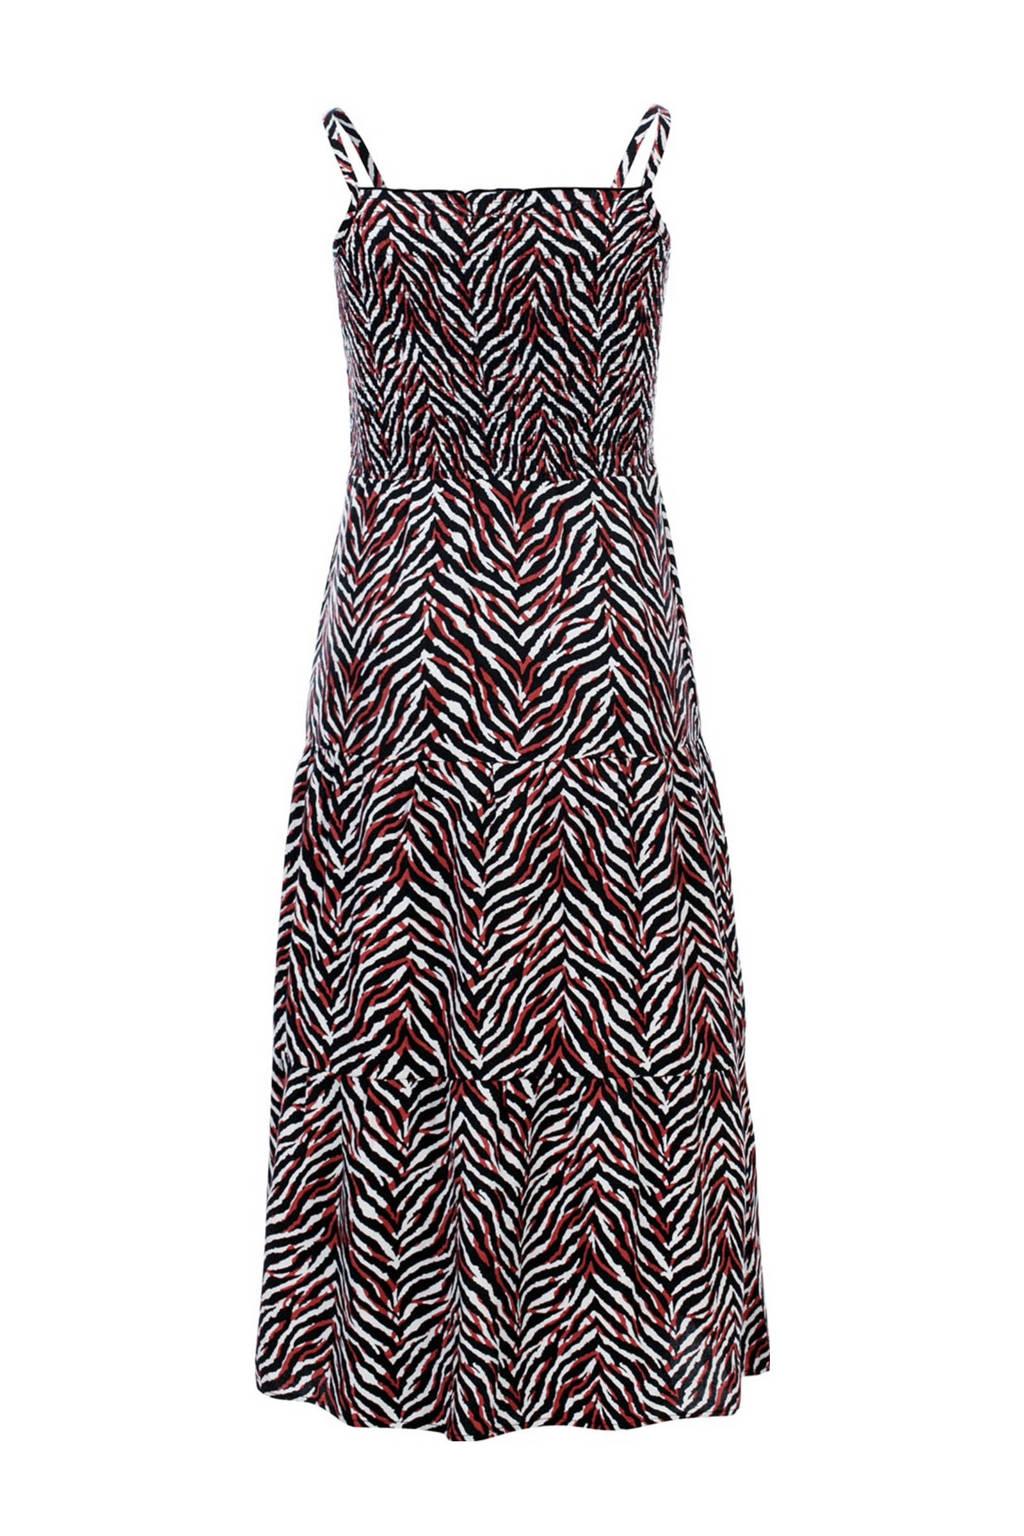 LOOXS 10sixteen maxi jurk met zebraprint zwart/rood/wit, Zwart/rood/wit